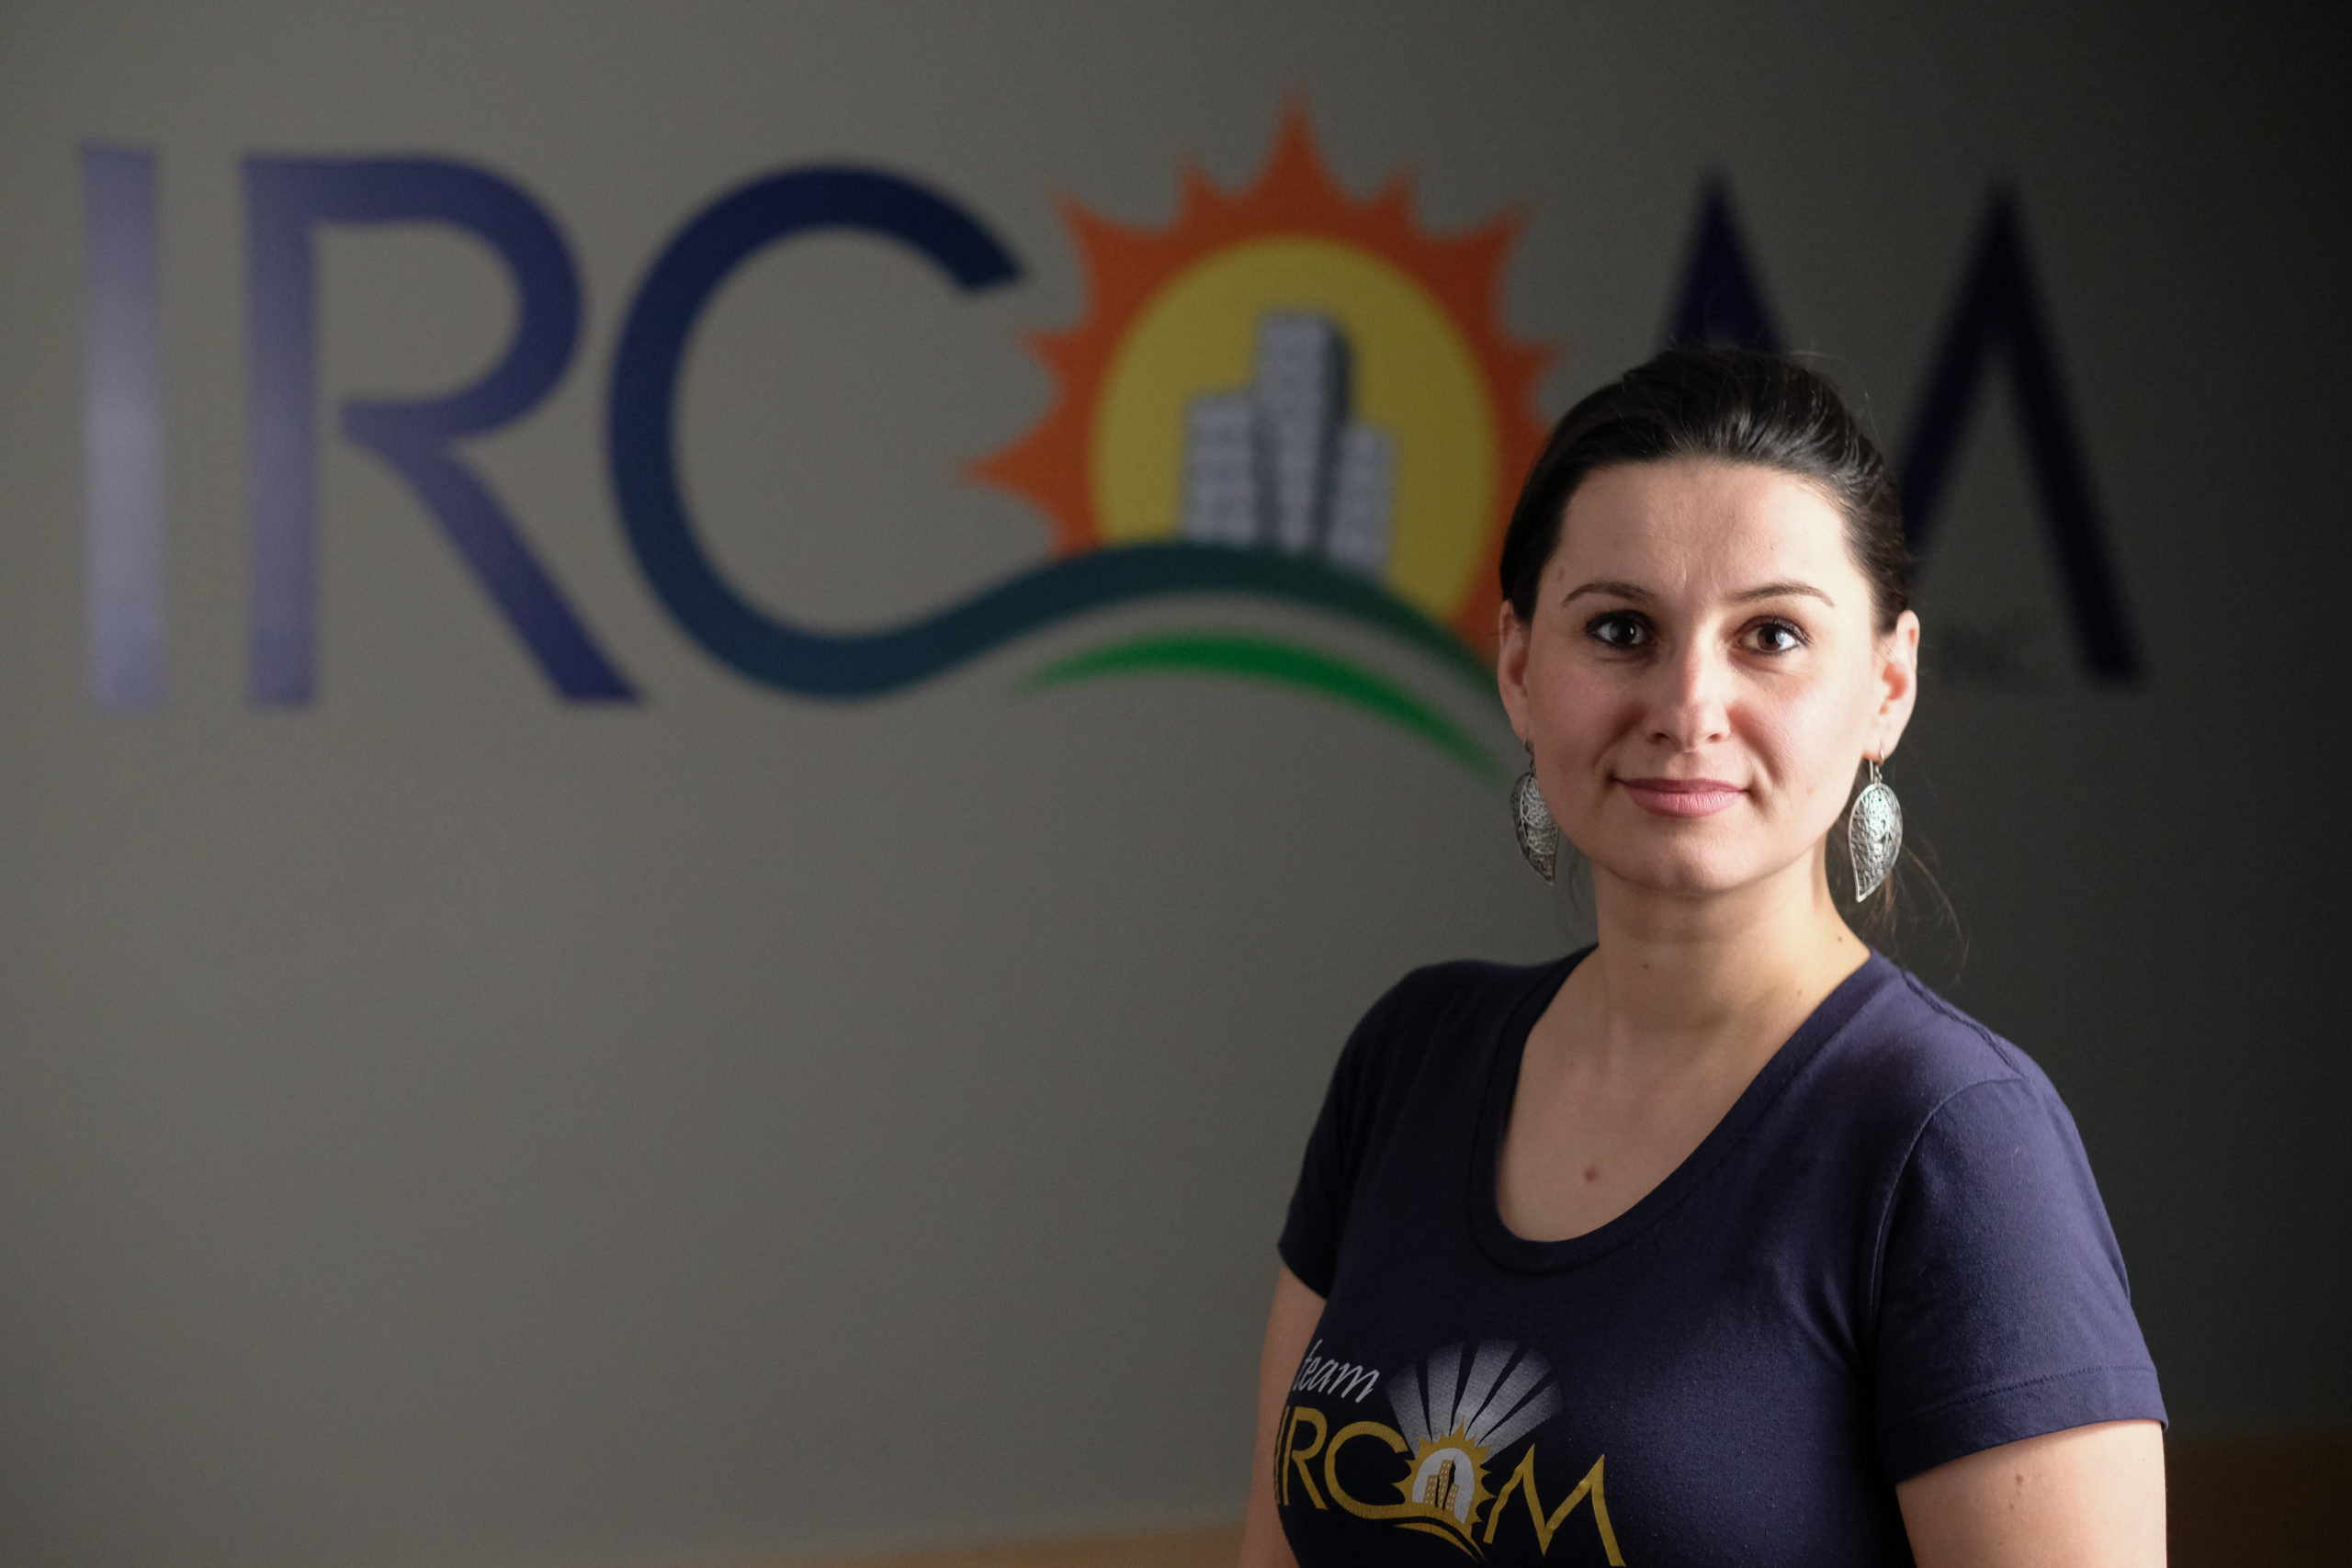 IRCOM bids farewell to its longest serving Executive Director